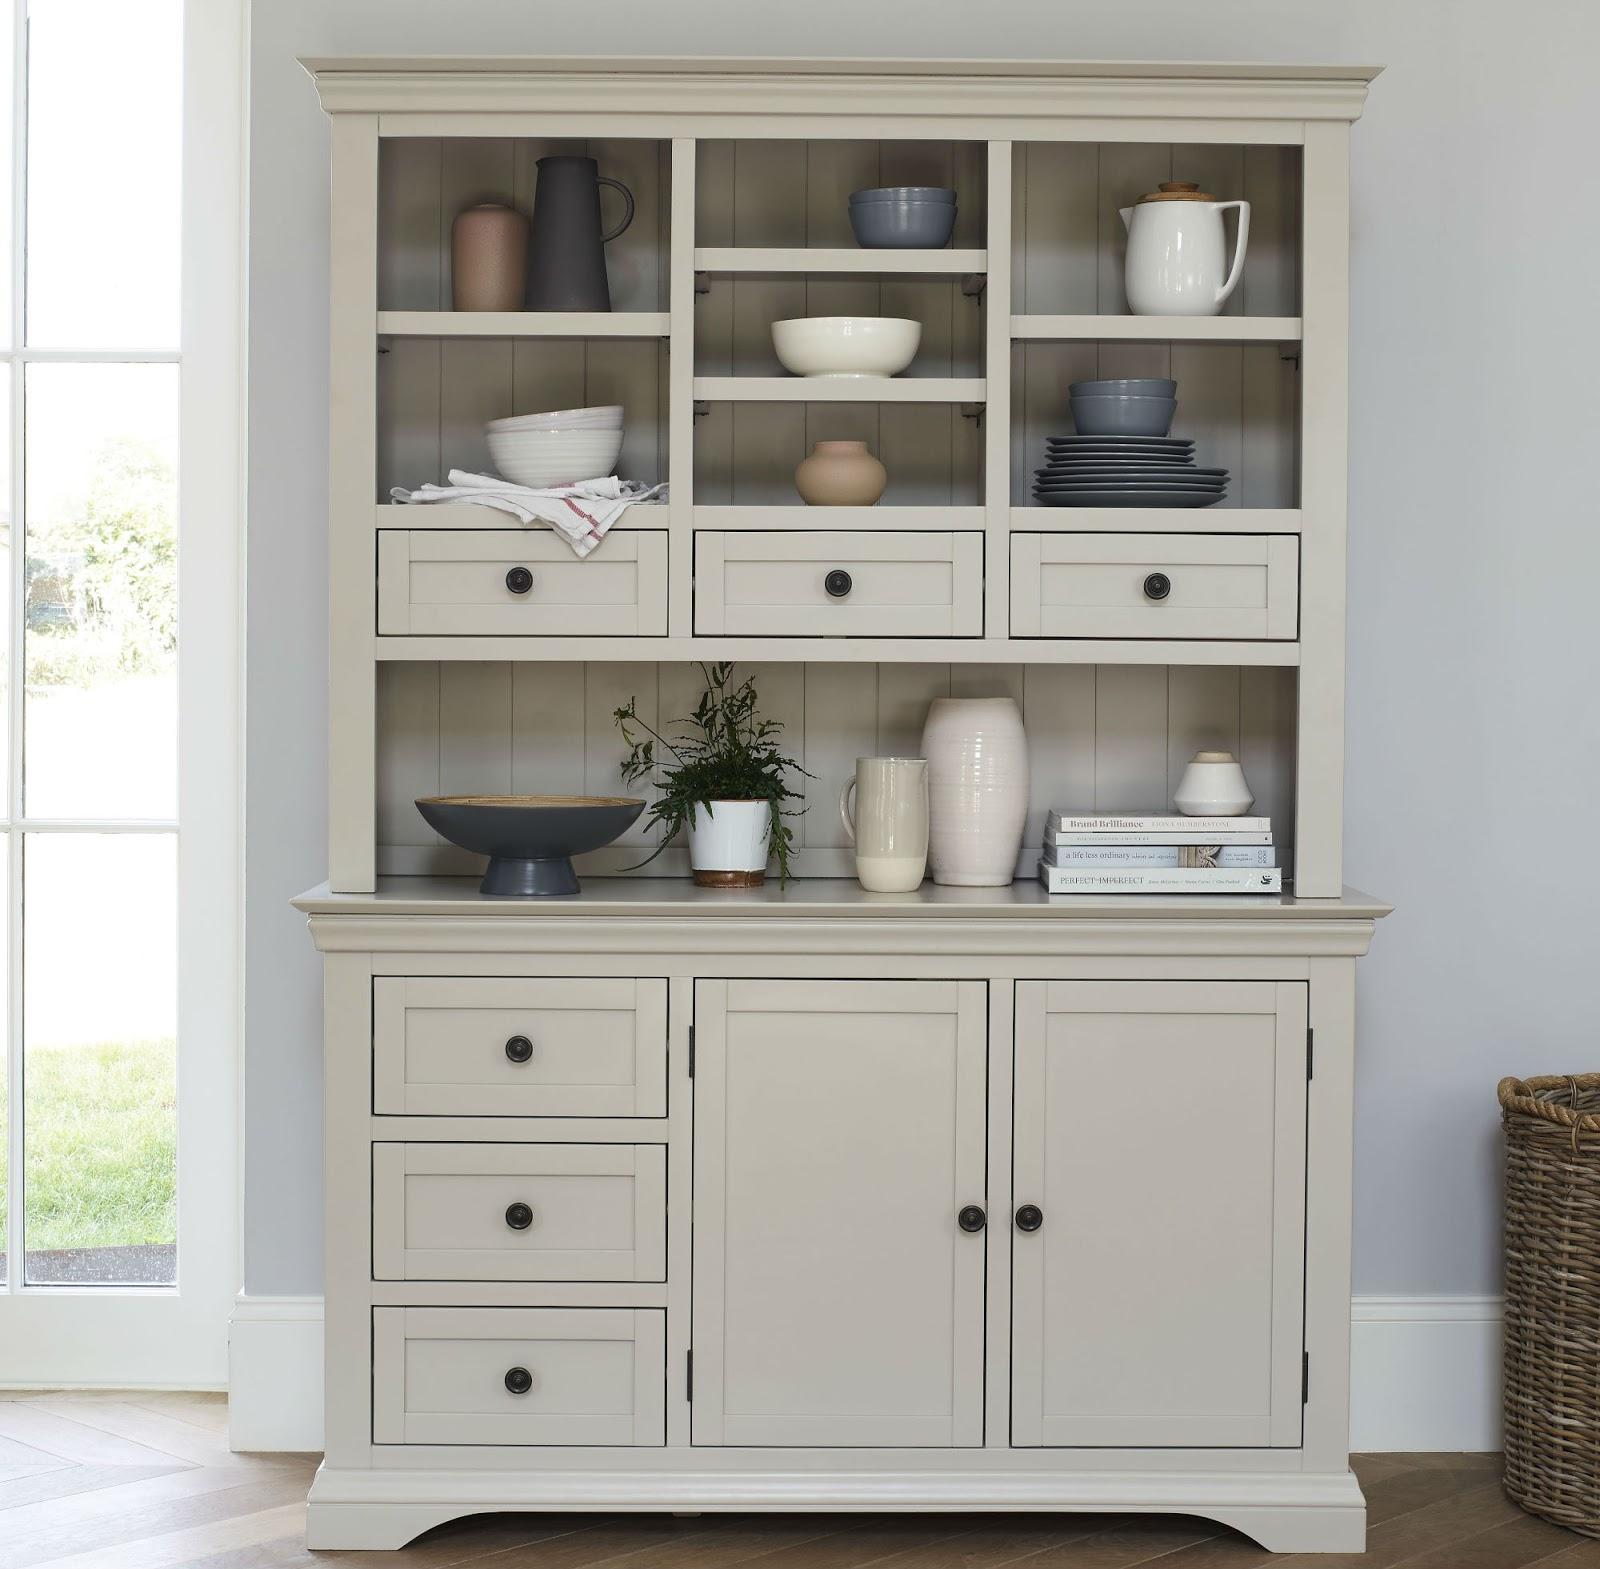 Arlette White Kitchen Dresser